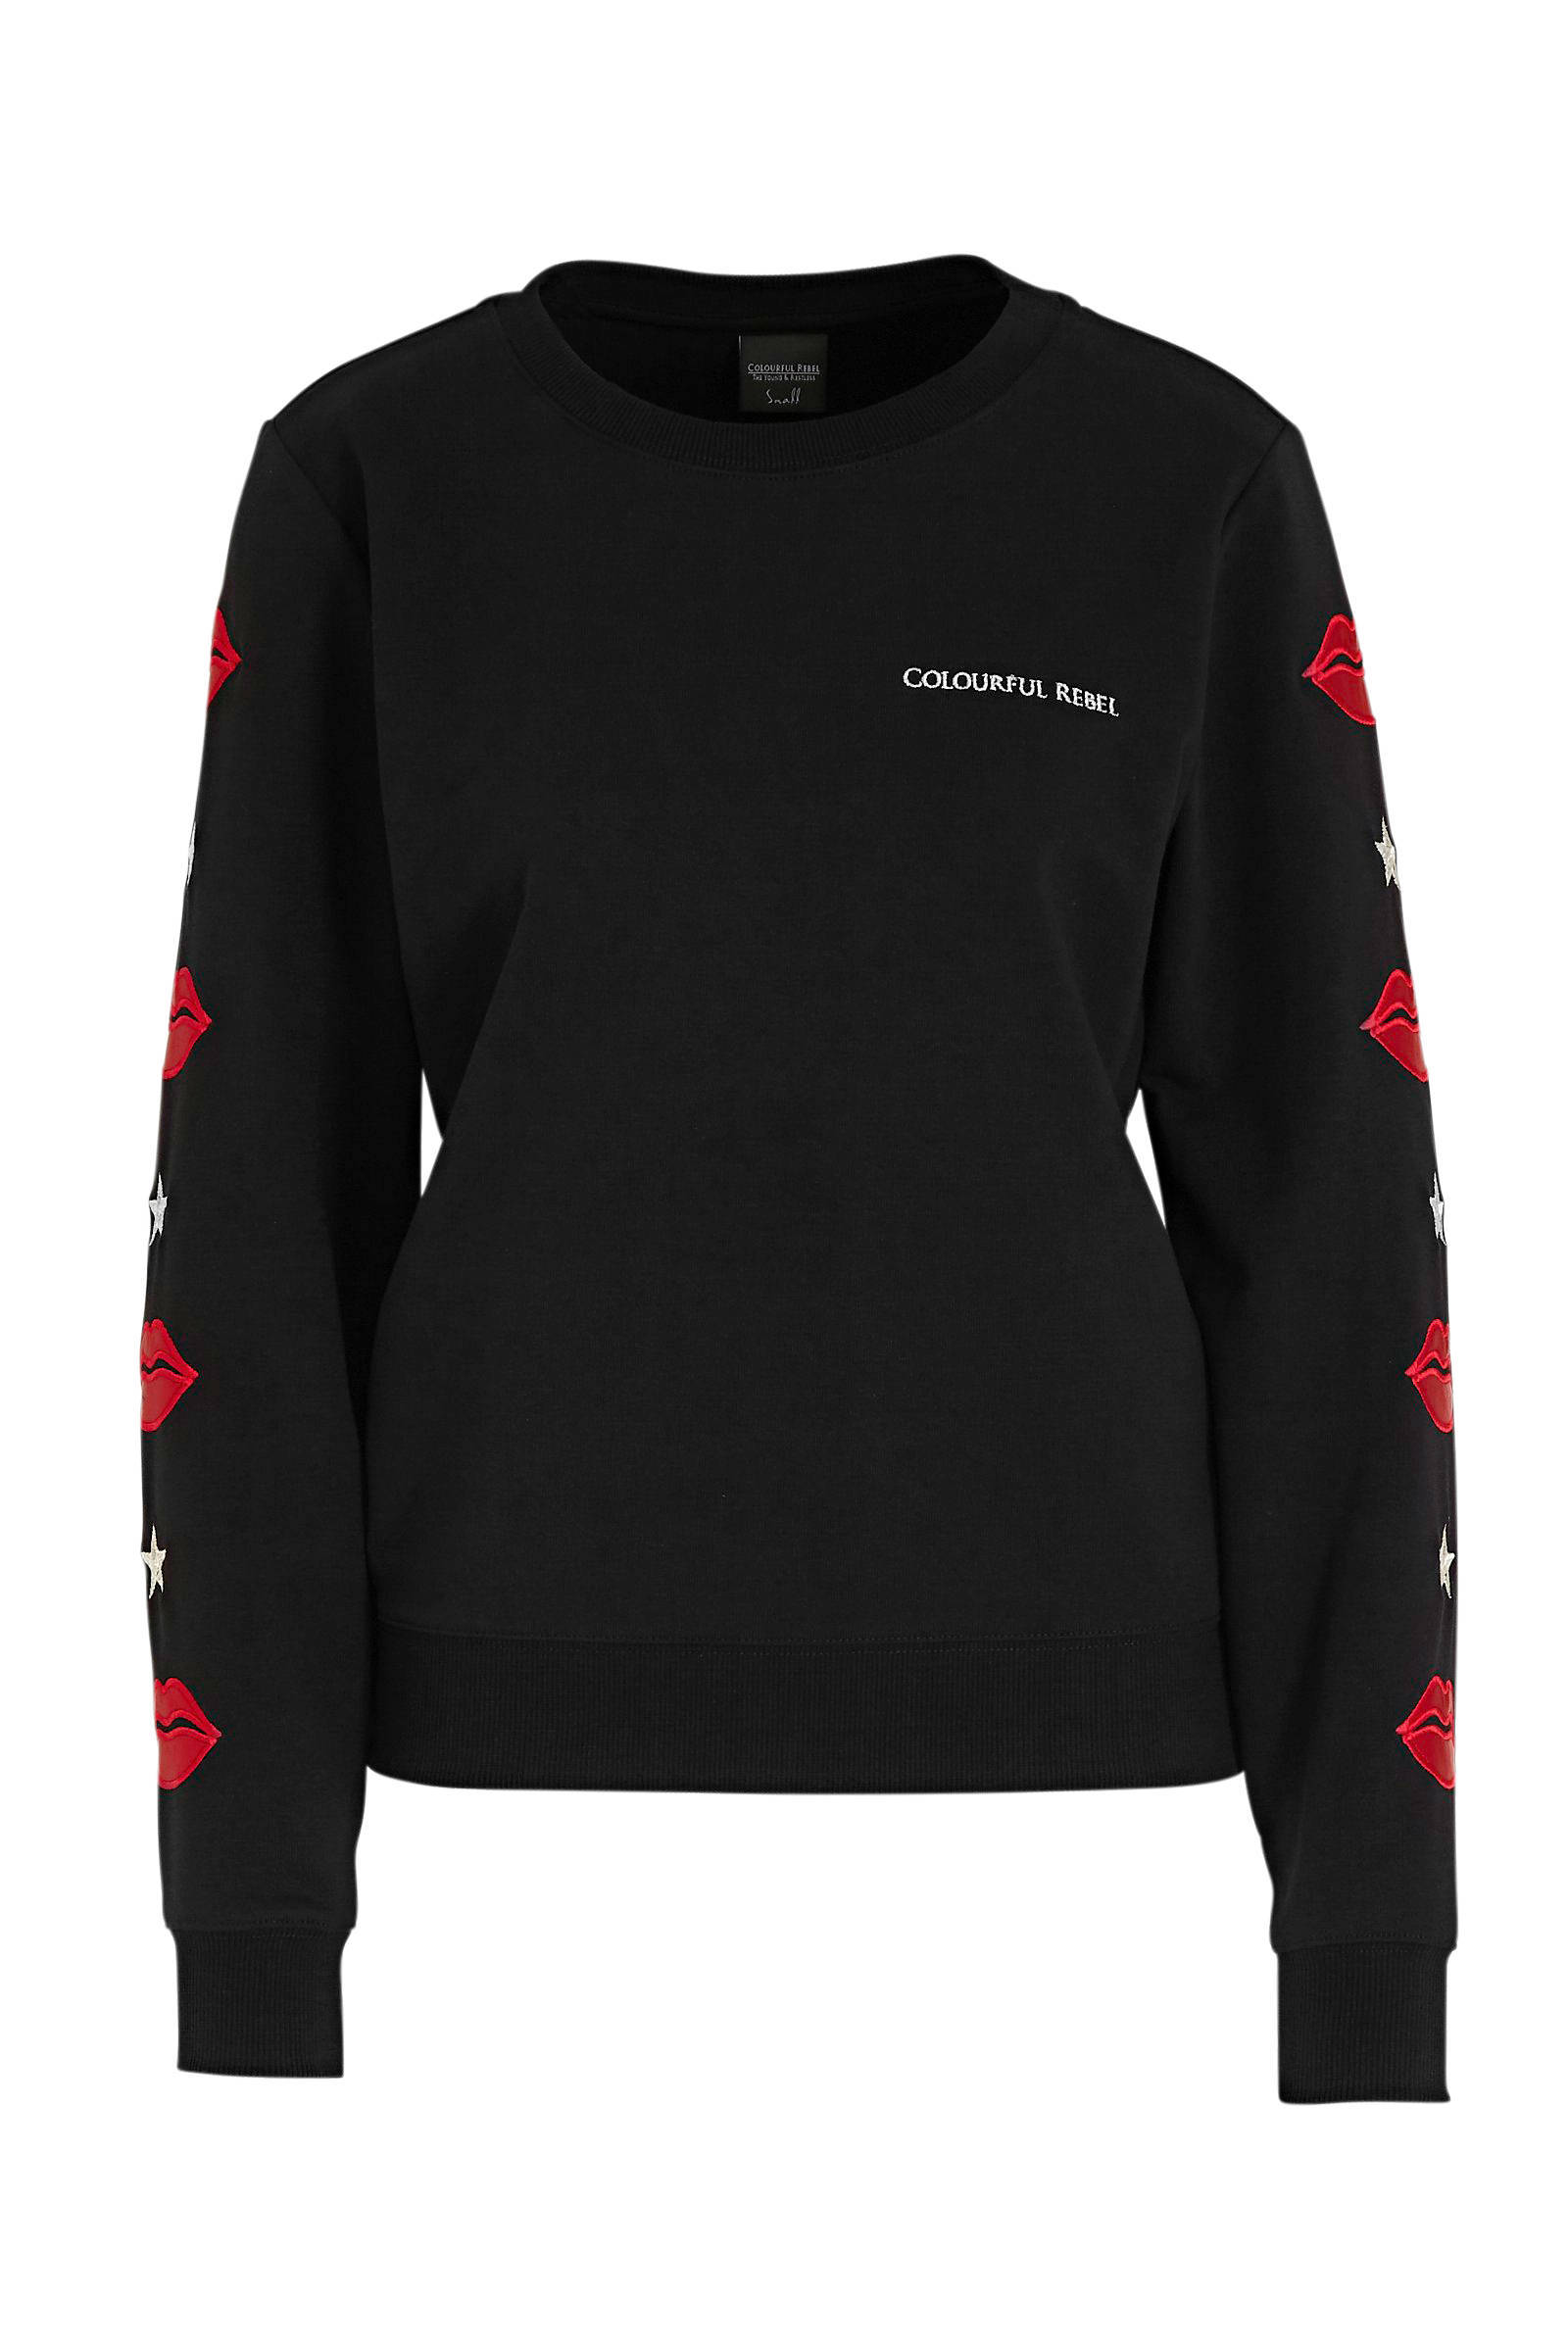 Colourful Rebel sweater Lip met borduursels zwart   wehkamp